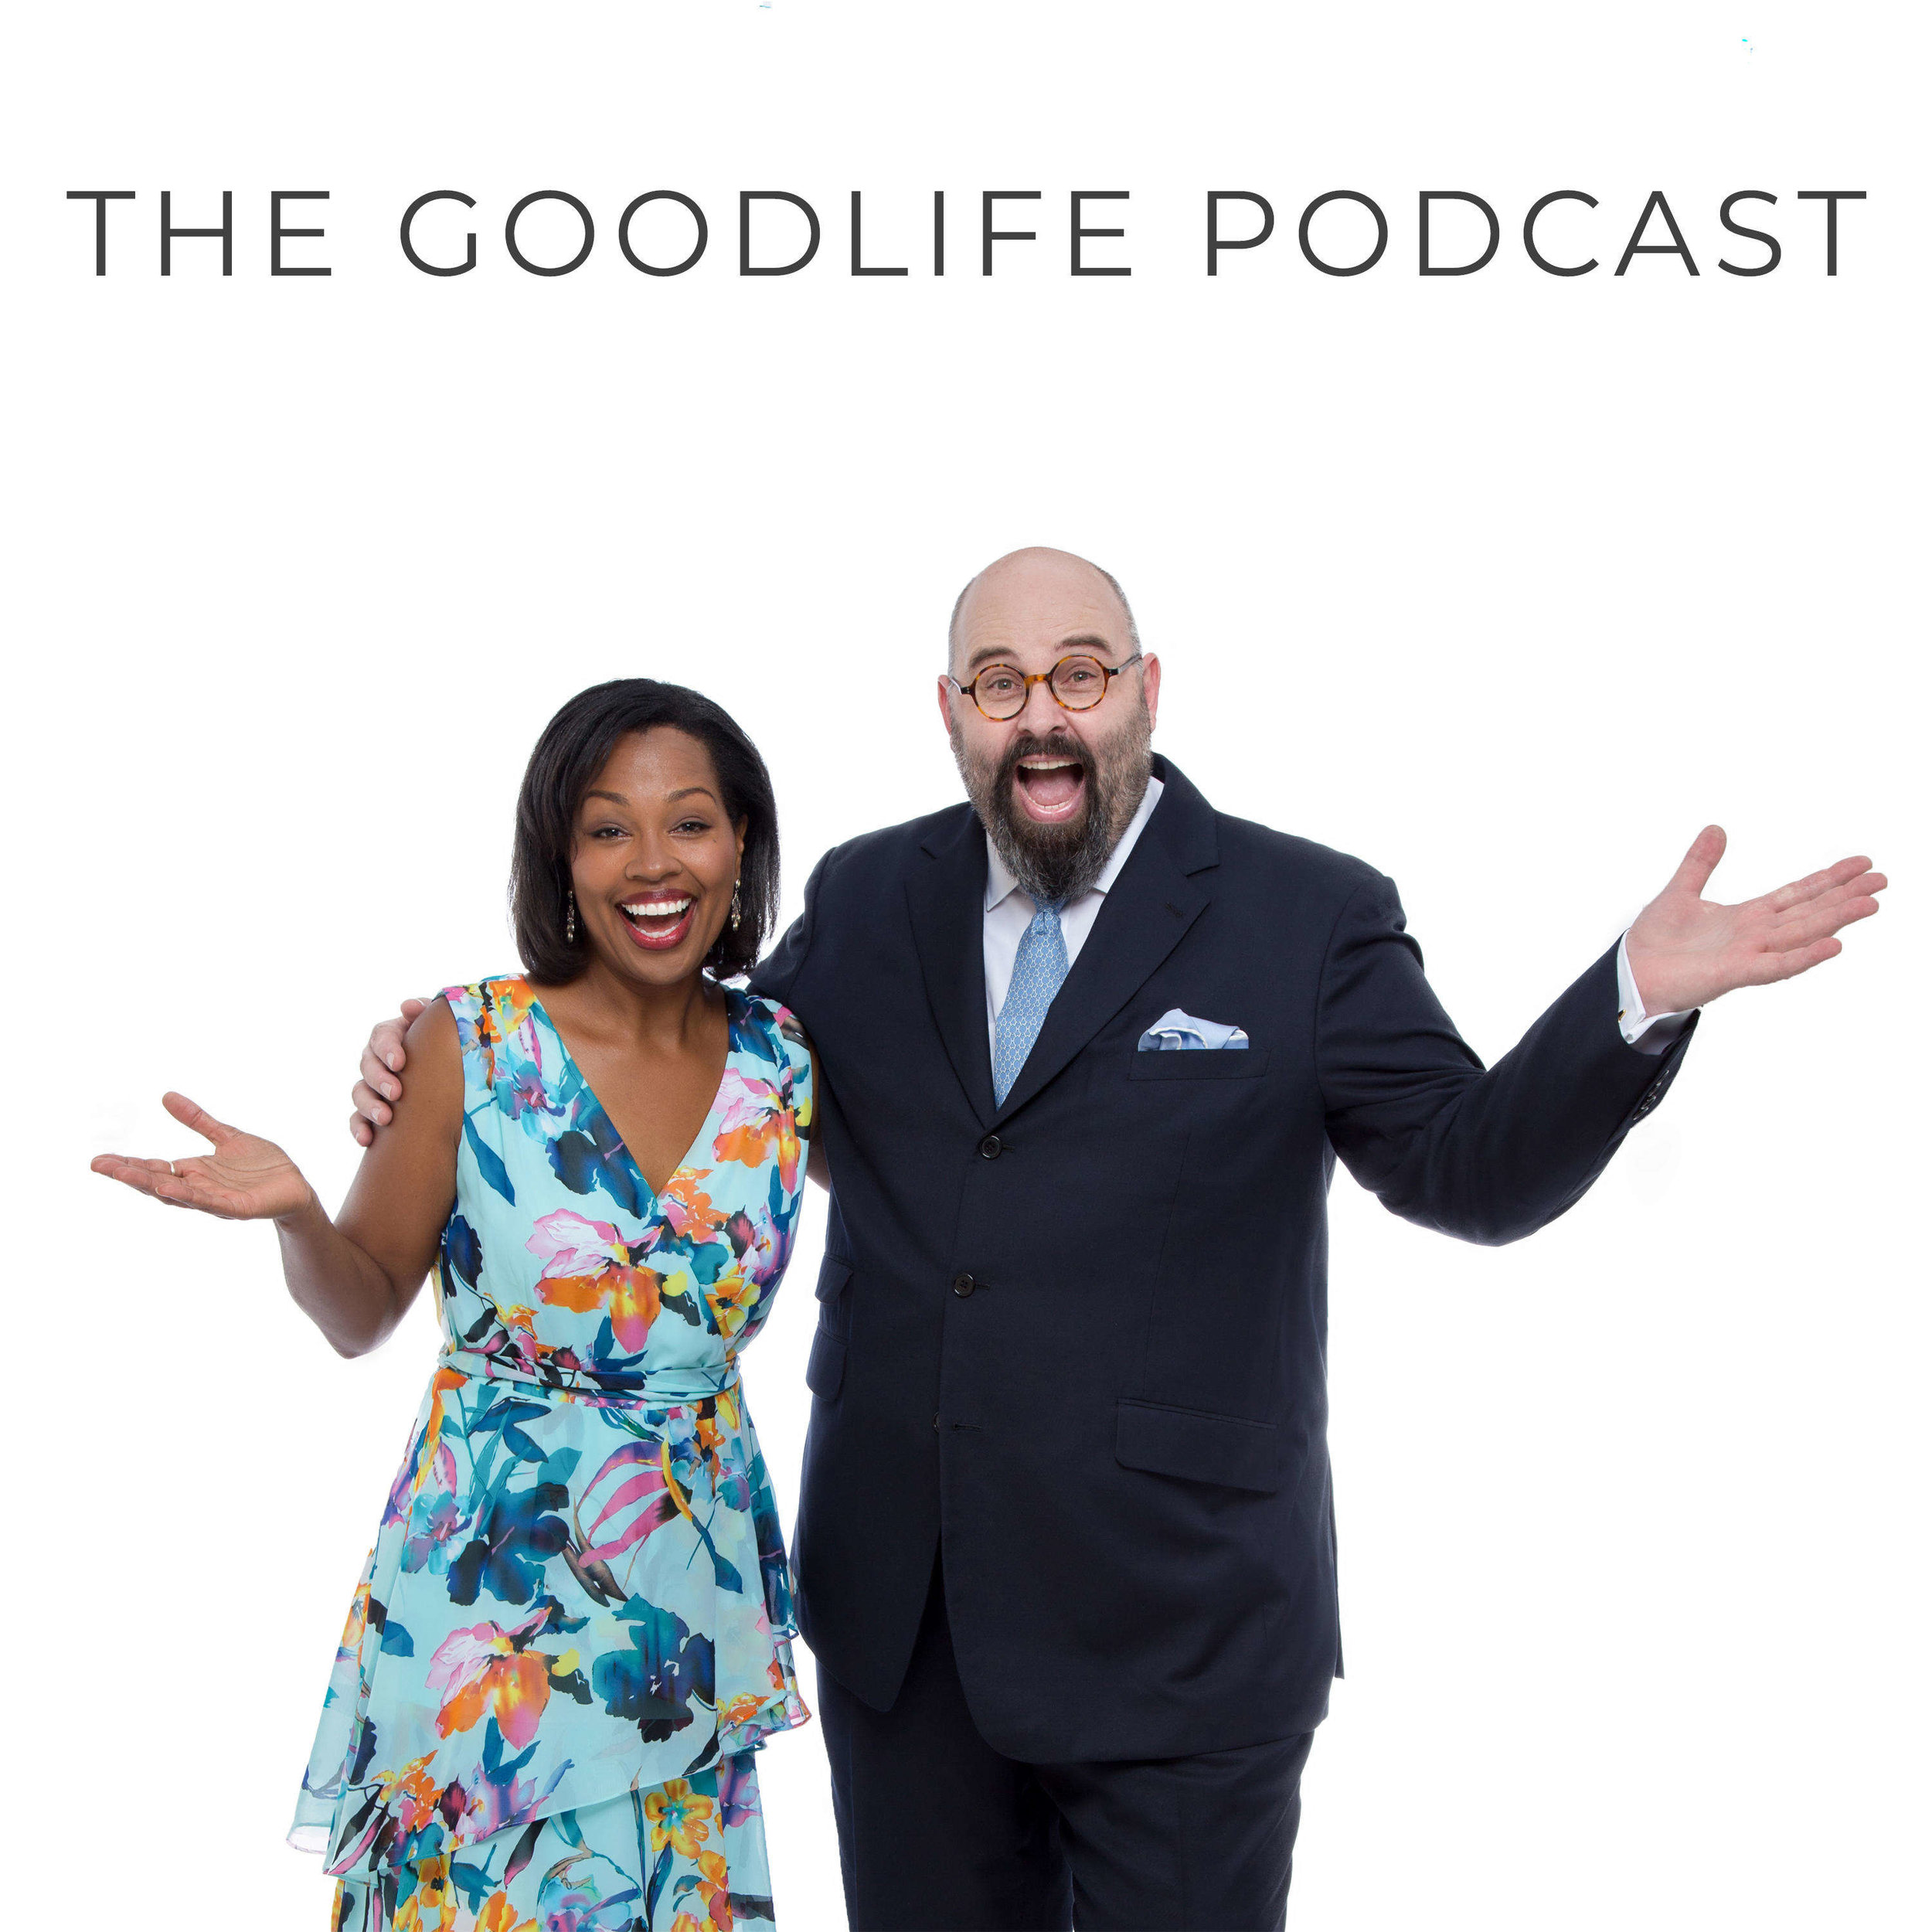 The Good Life Podcast Thumbnail.jpeg